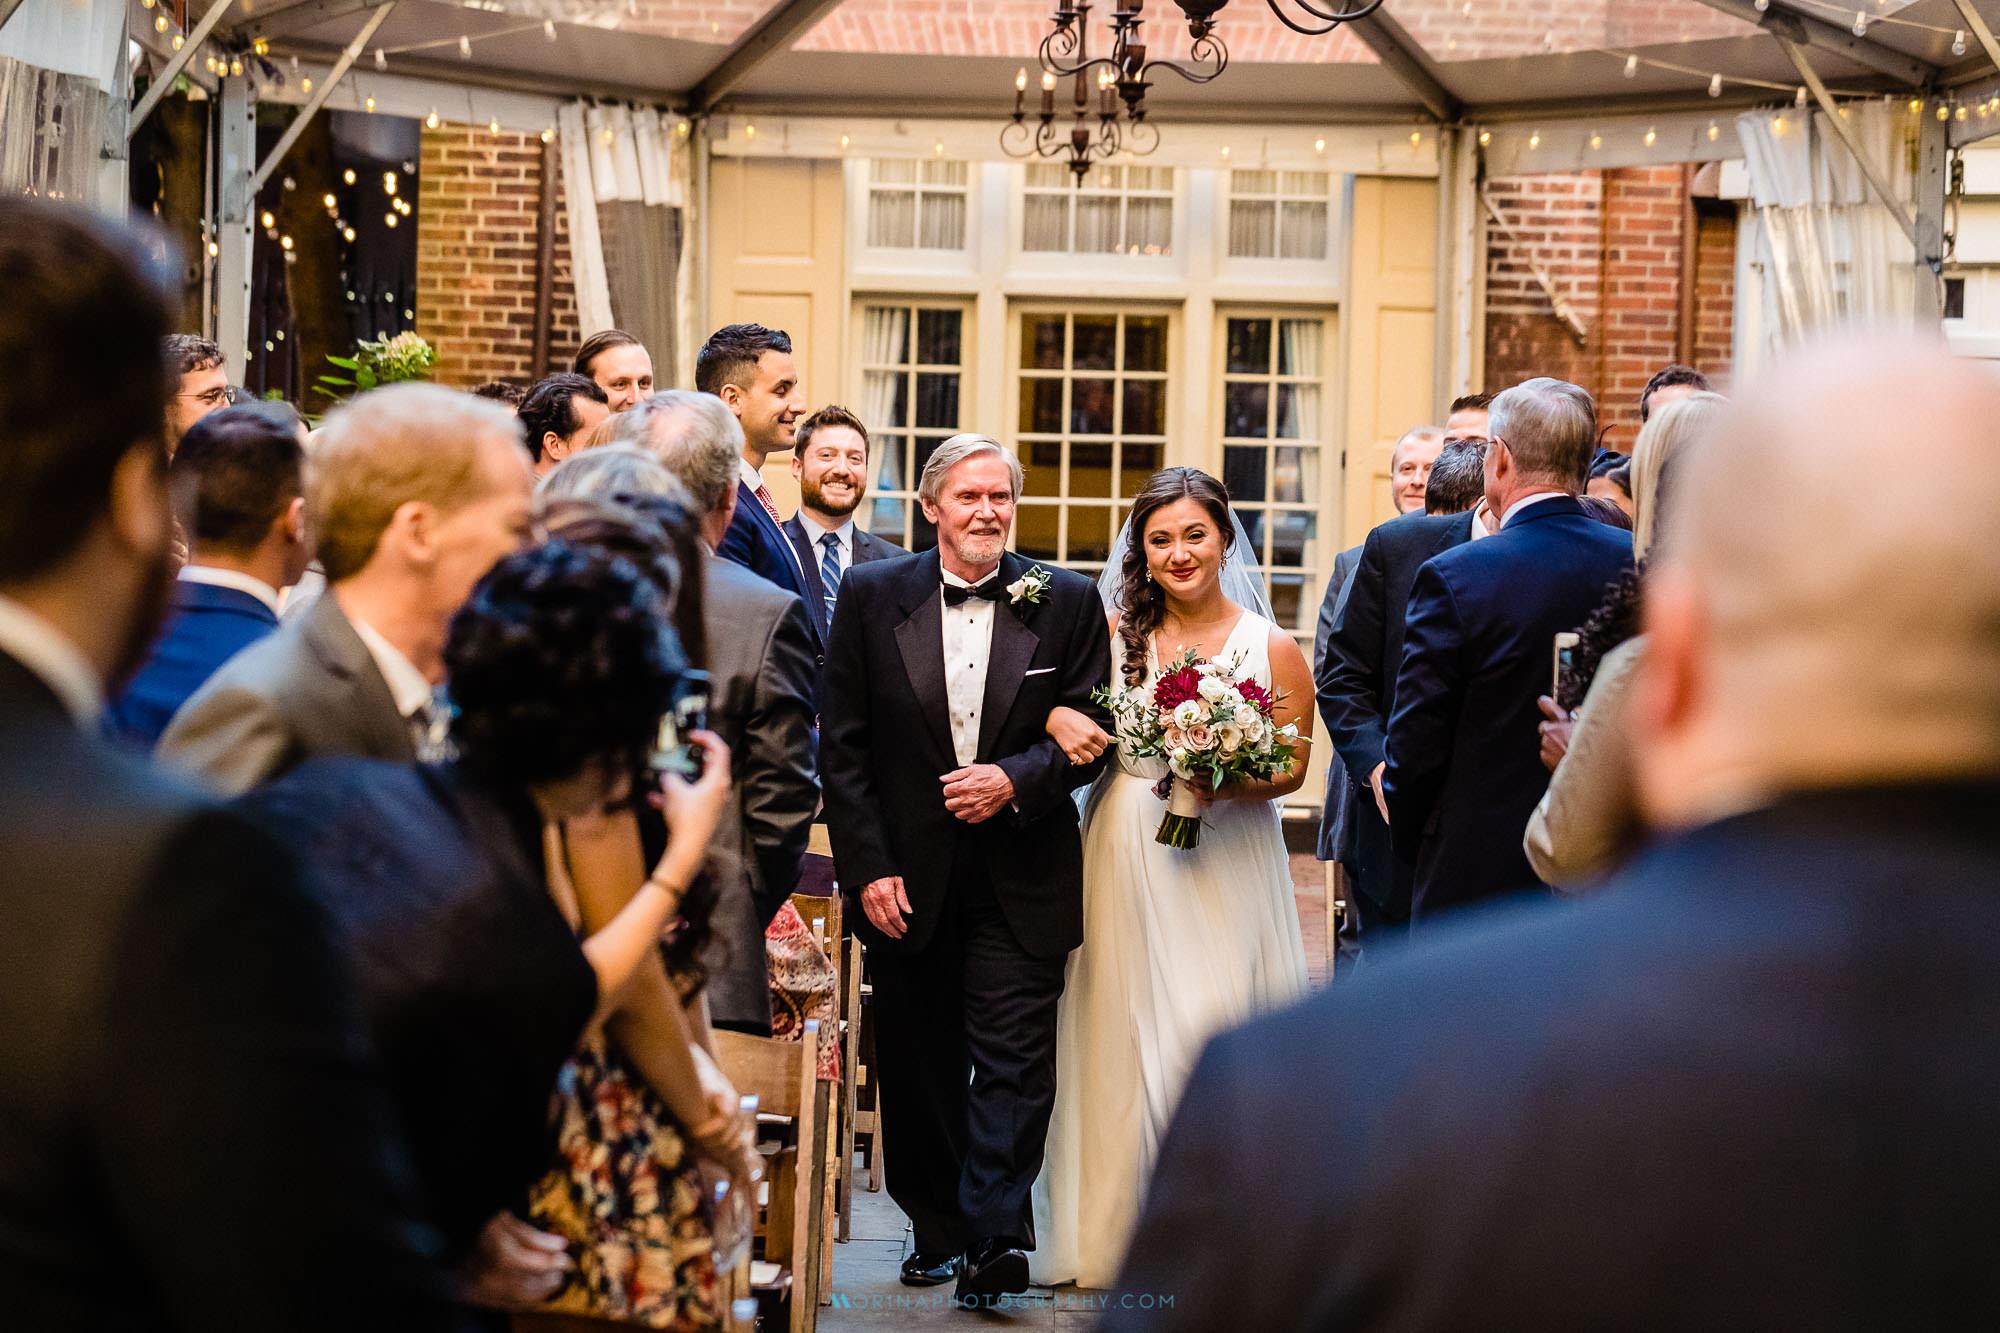 Yuki & Michael Wedding at Morris House Hotel Blog 0067.jpg